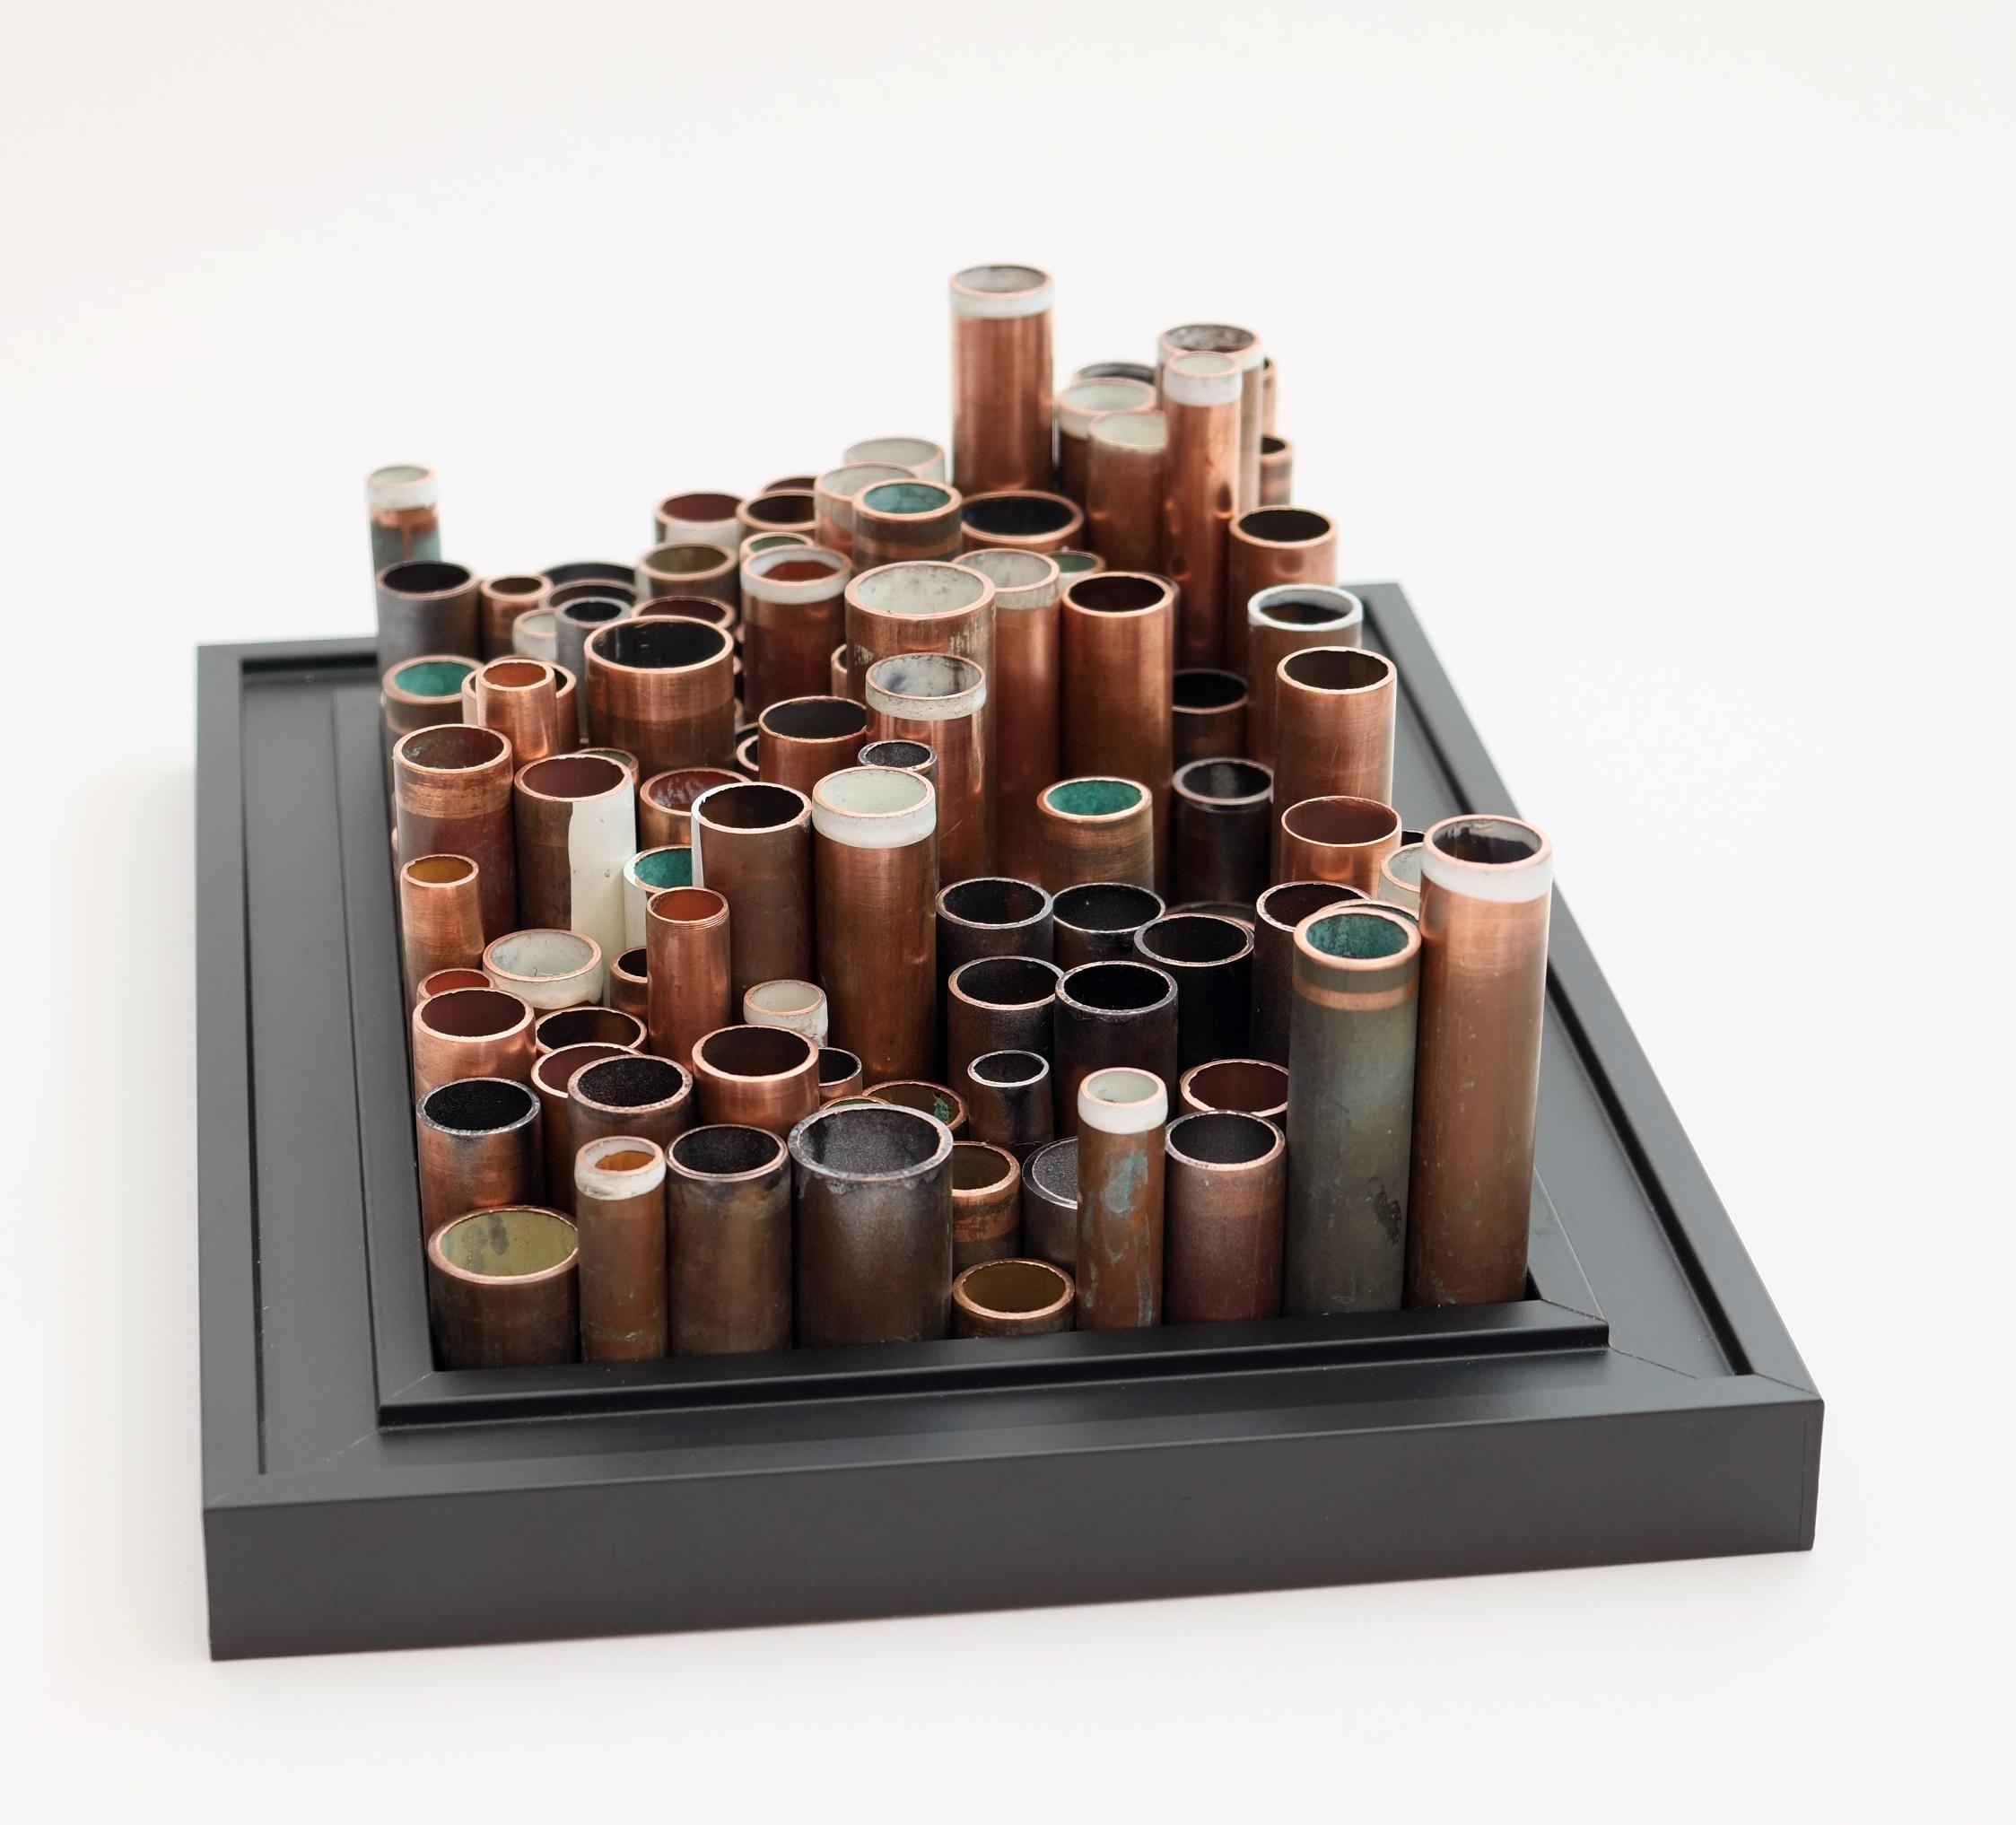 Copper Weave Metal Wall Art Panel | Wallsloveart | Foundmyself Inside Metal Framed Wall Art (Image 2 of 20)